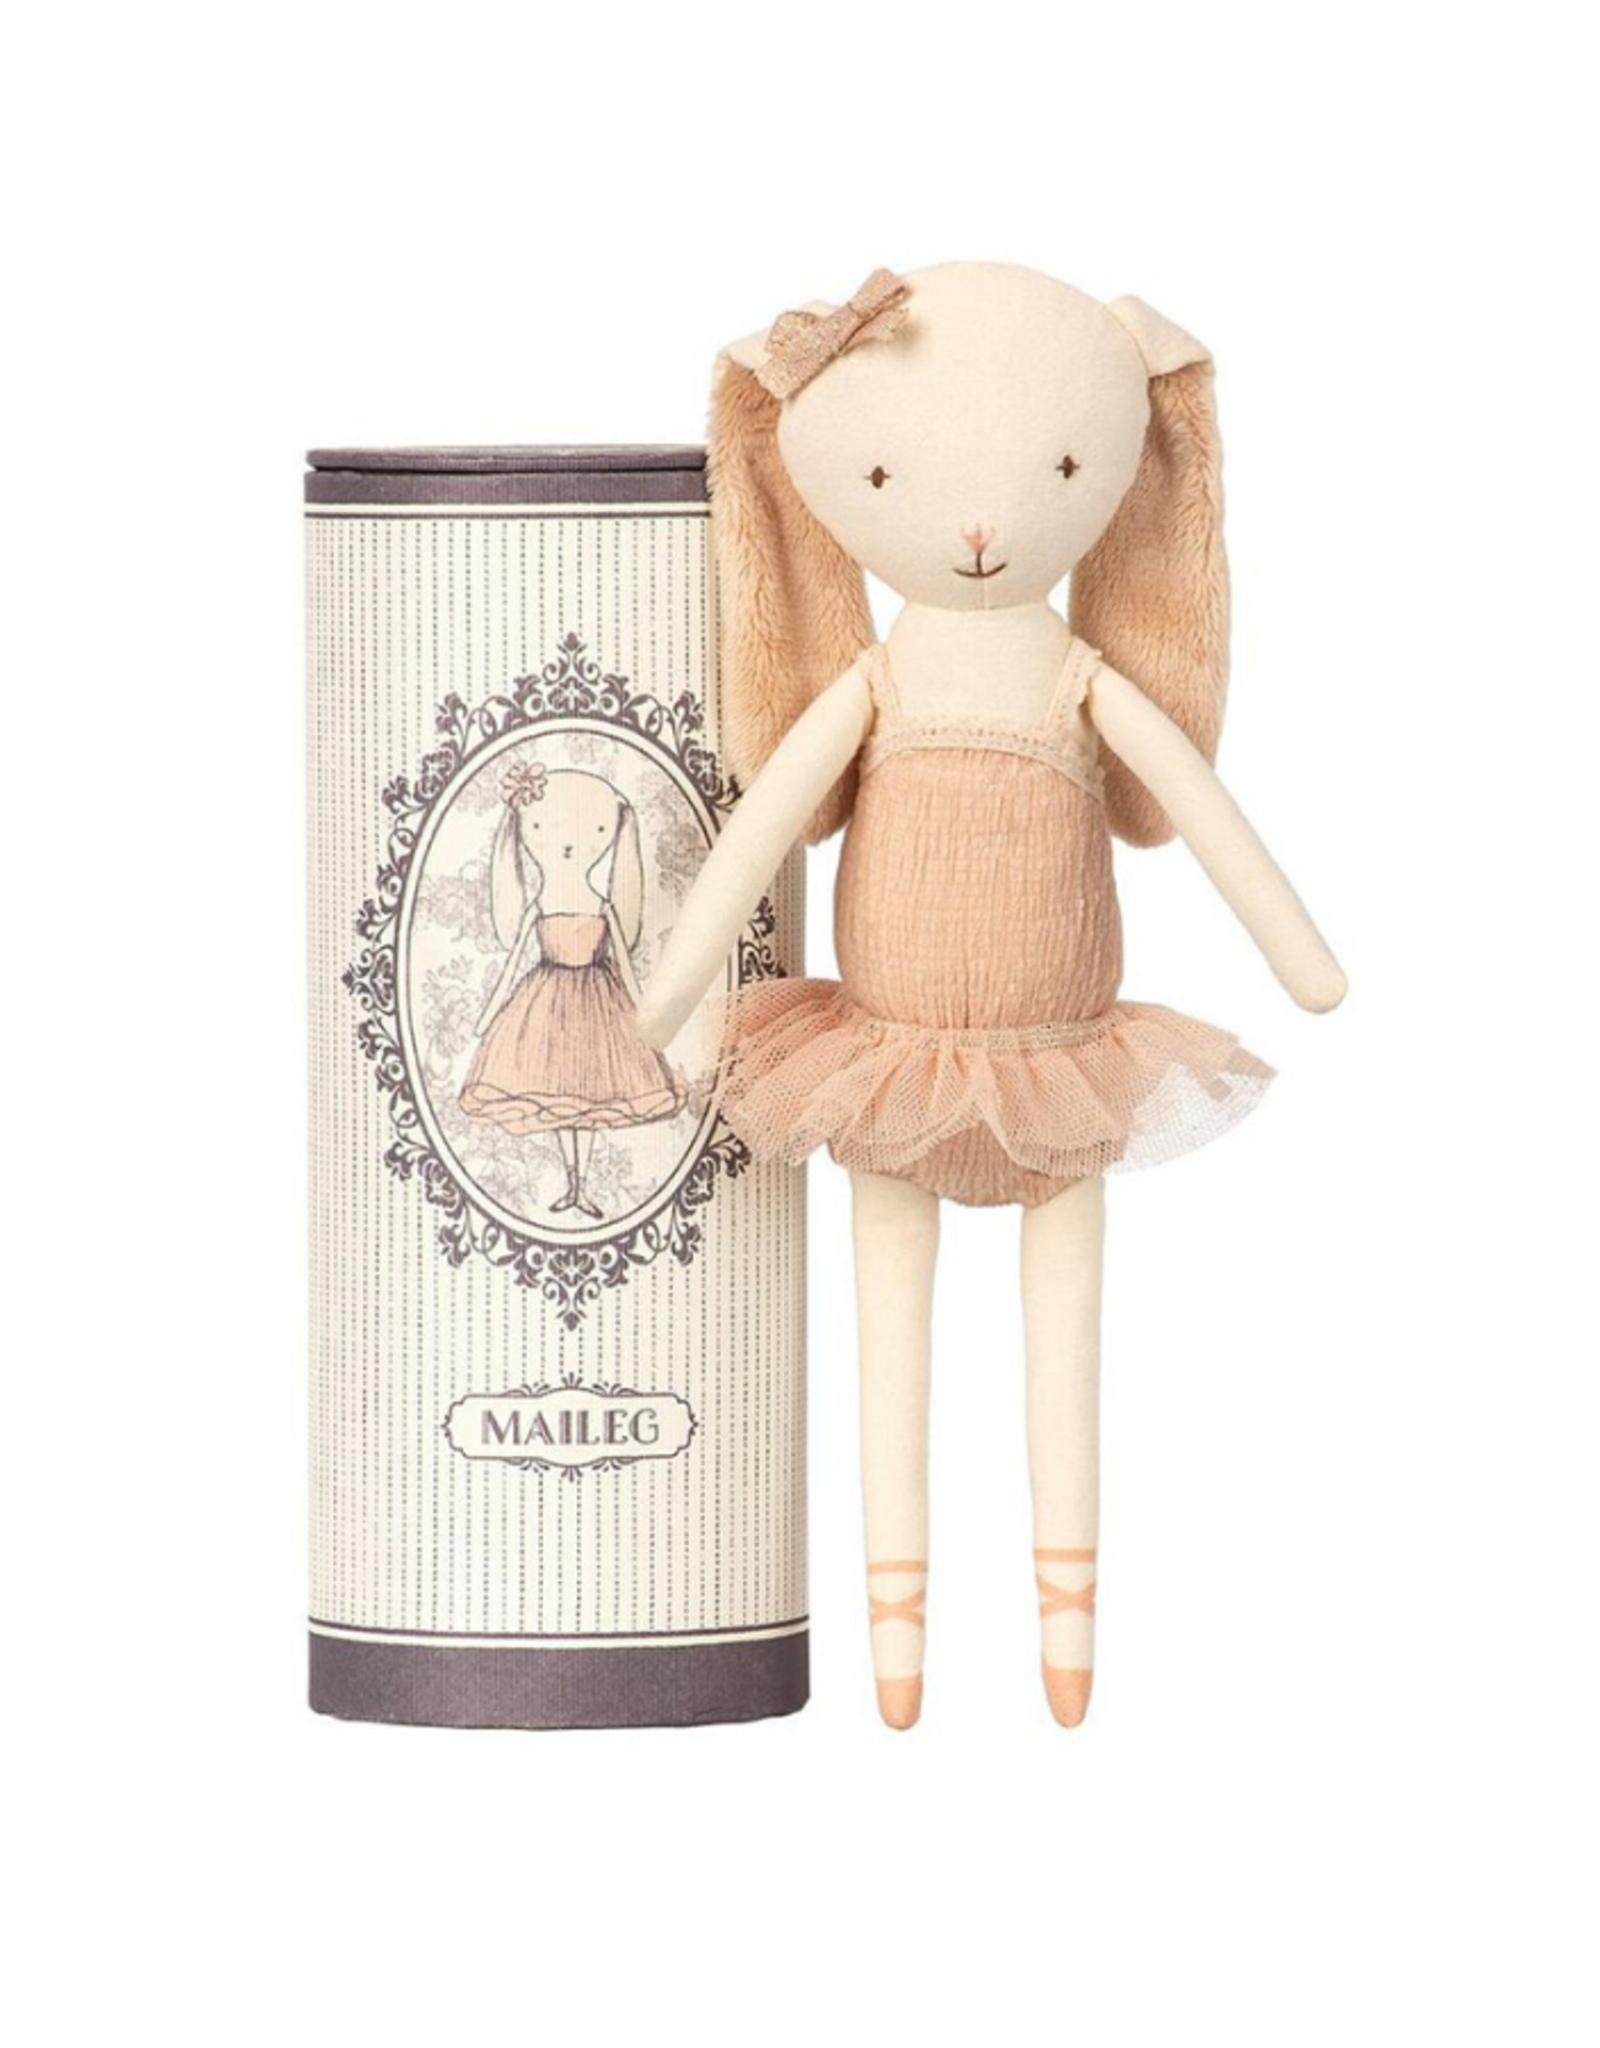 Maileg Maileg - Ballerina Bunny In Tube